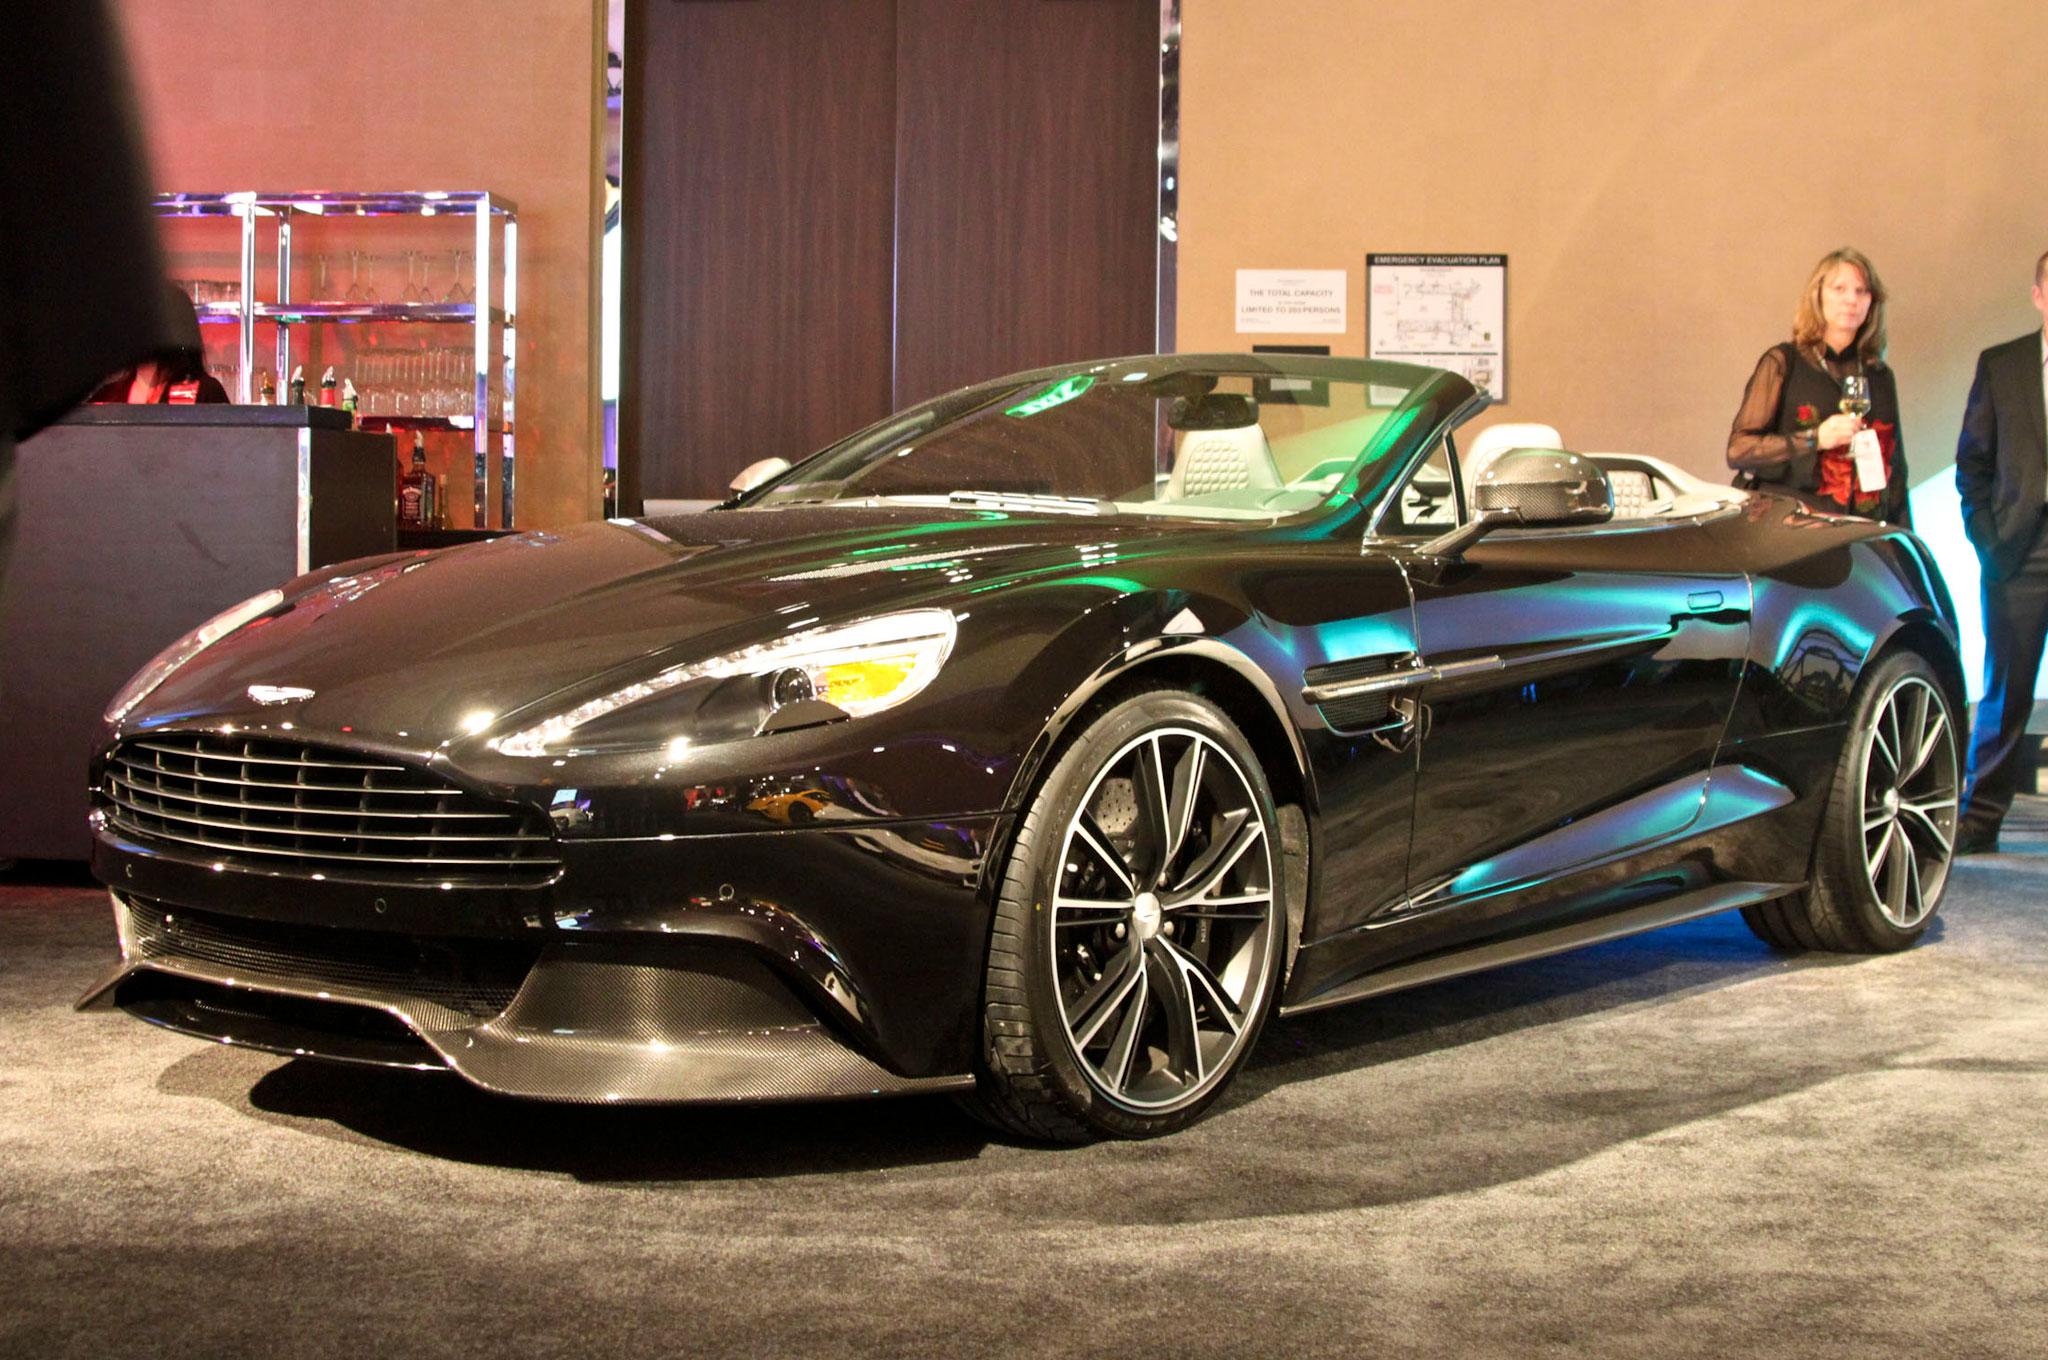 2014 Aston Martin Vanquish Volante Review - Automobile Magazine